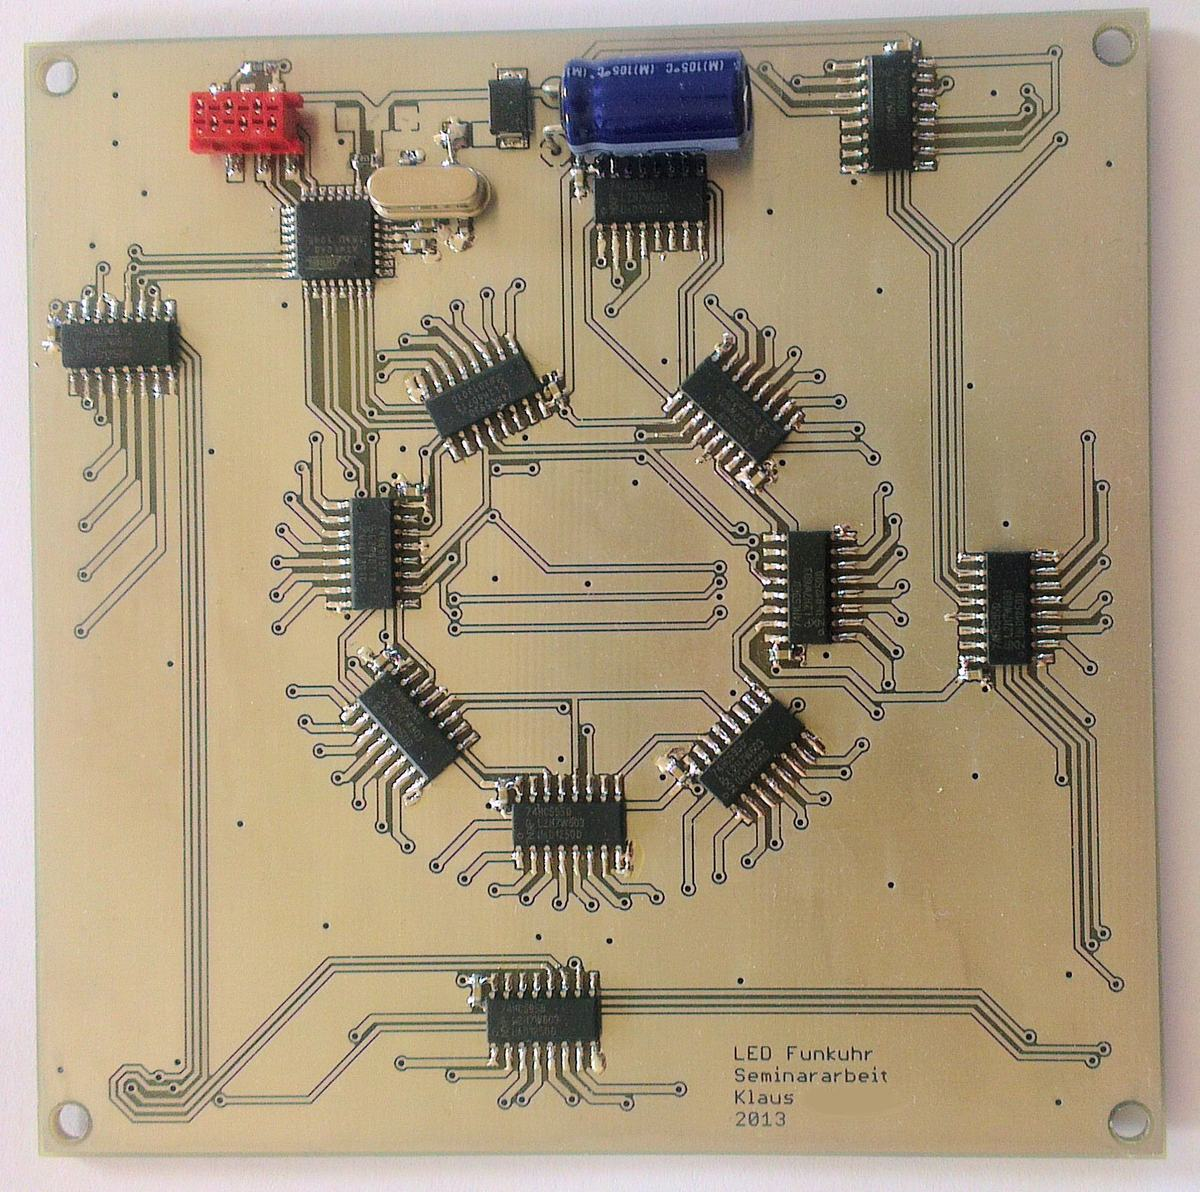 Miraculous Dcf77 Funkuhr Hilfe Bei Der Programmierung Mikrocontroller Net Wiring 101 Vieworaxxcnl